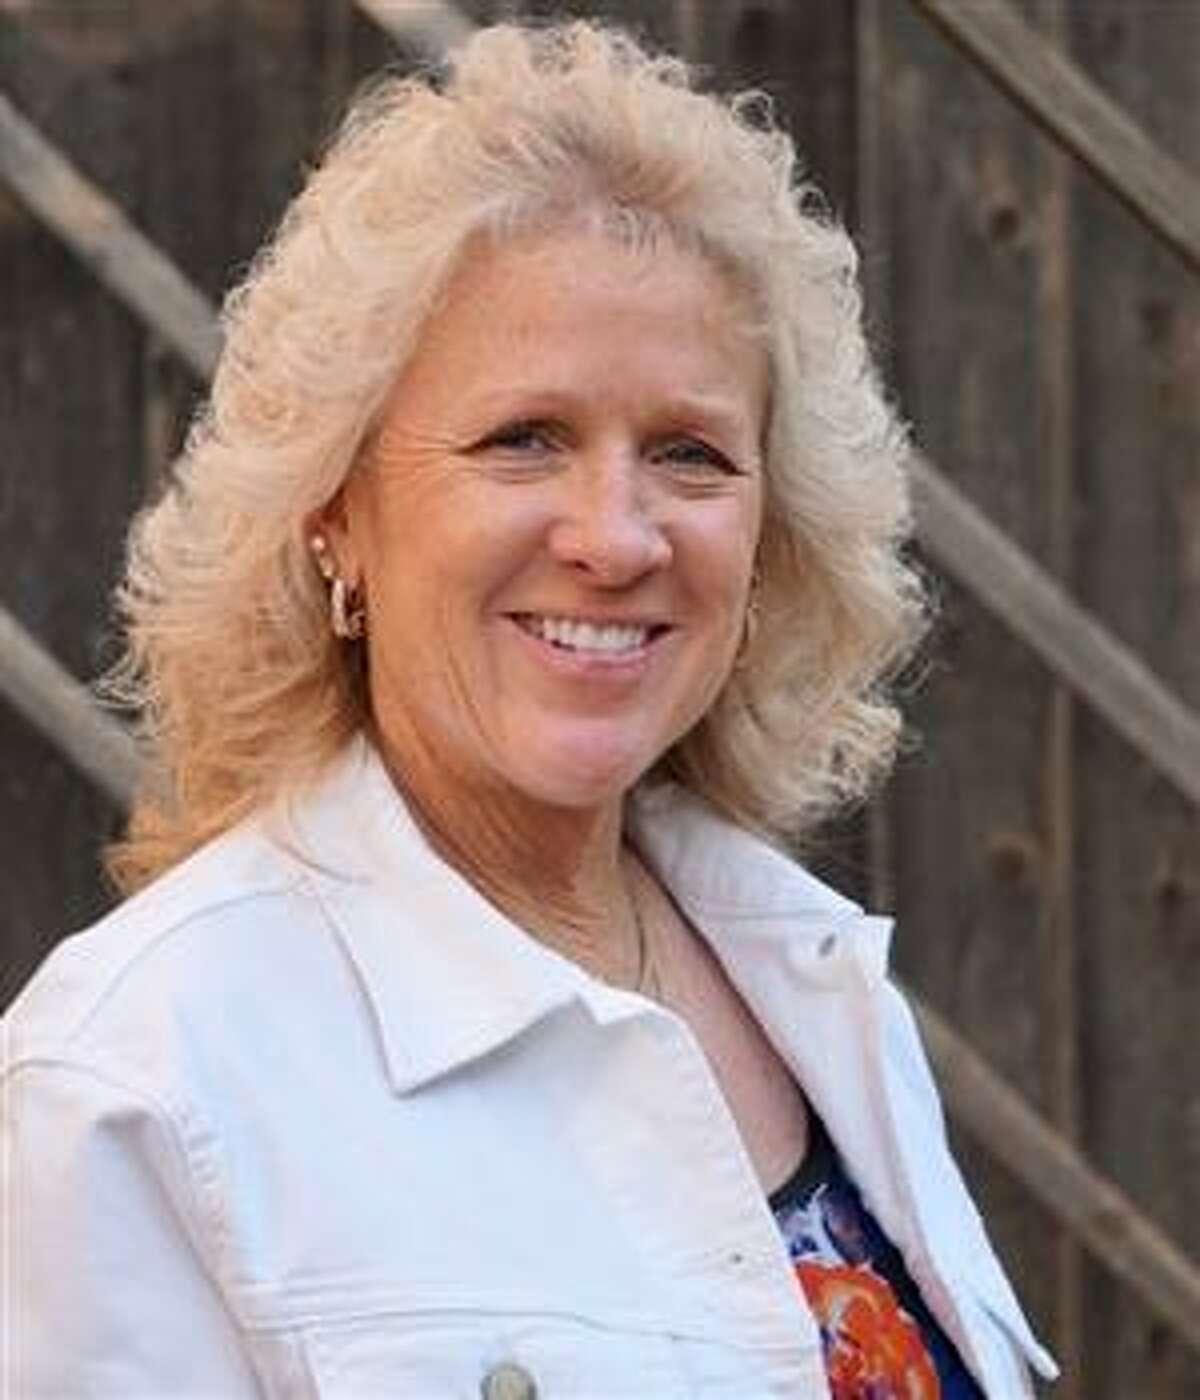 Tracey Borchardt, EctorCounty ISD Executive Director of Athletics